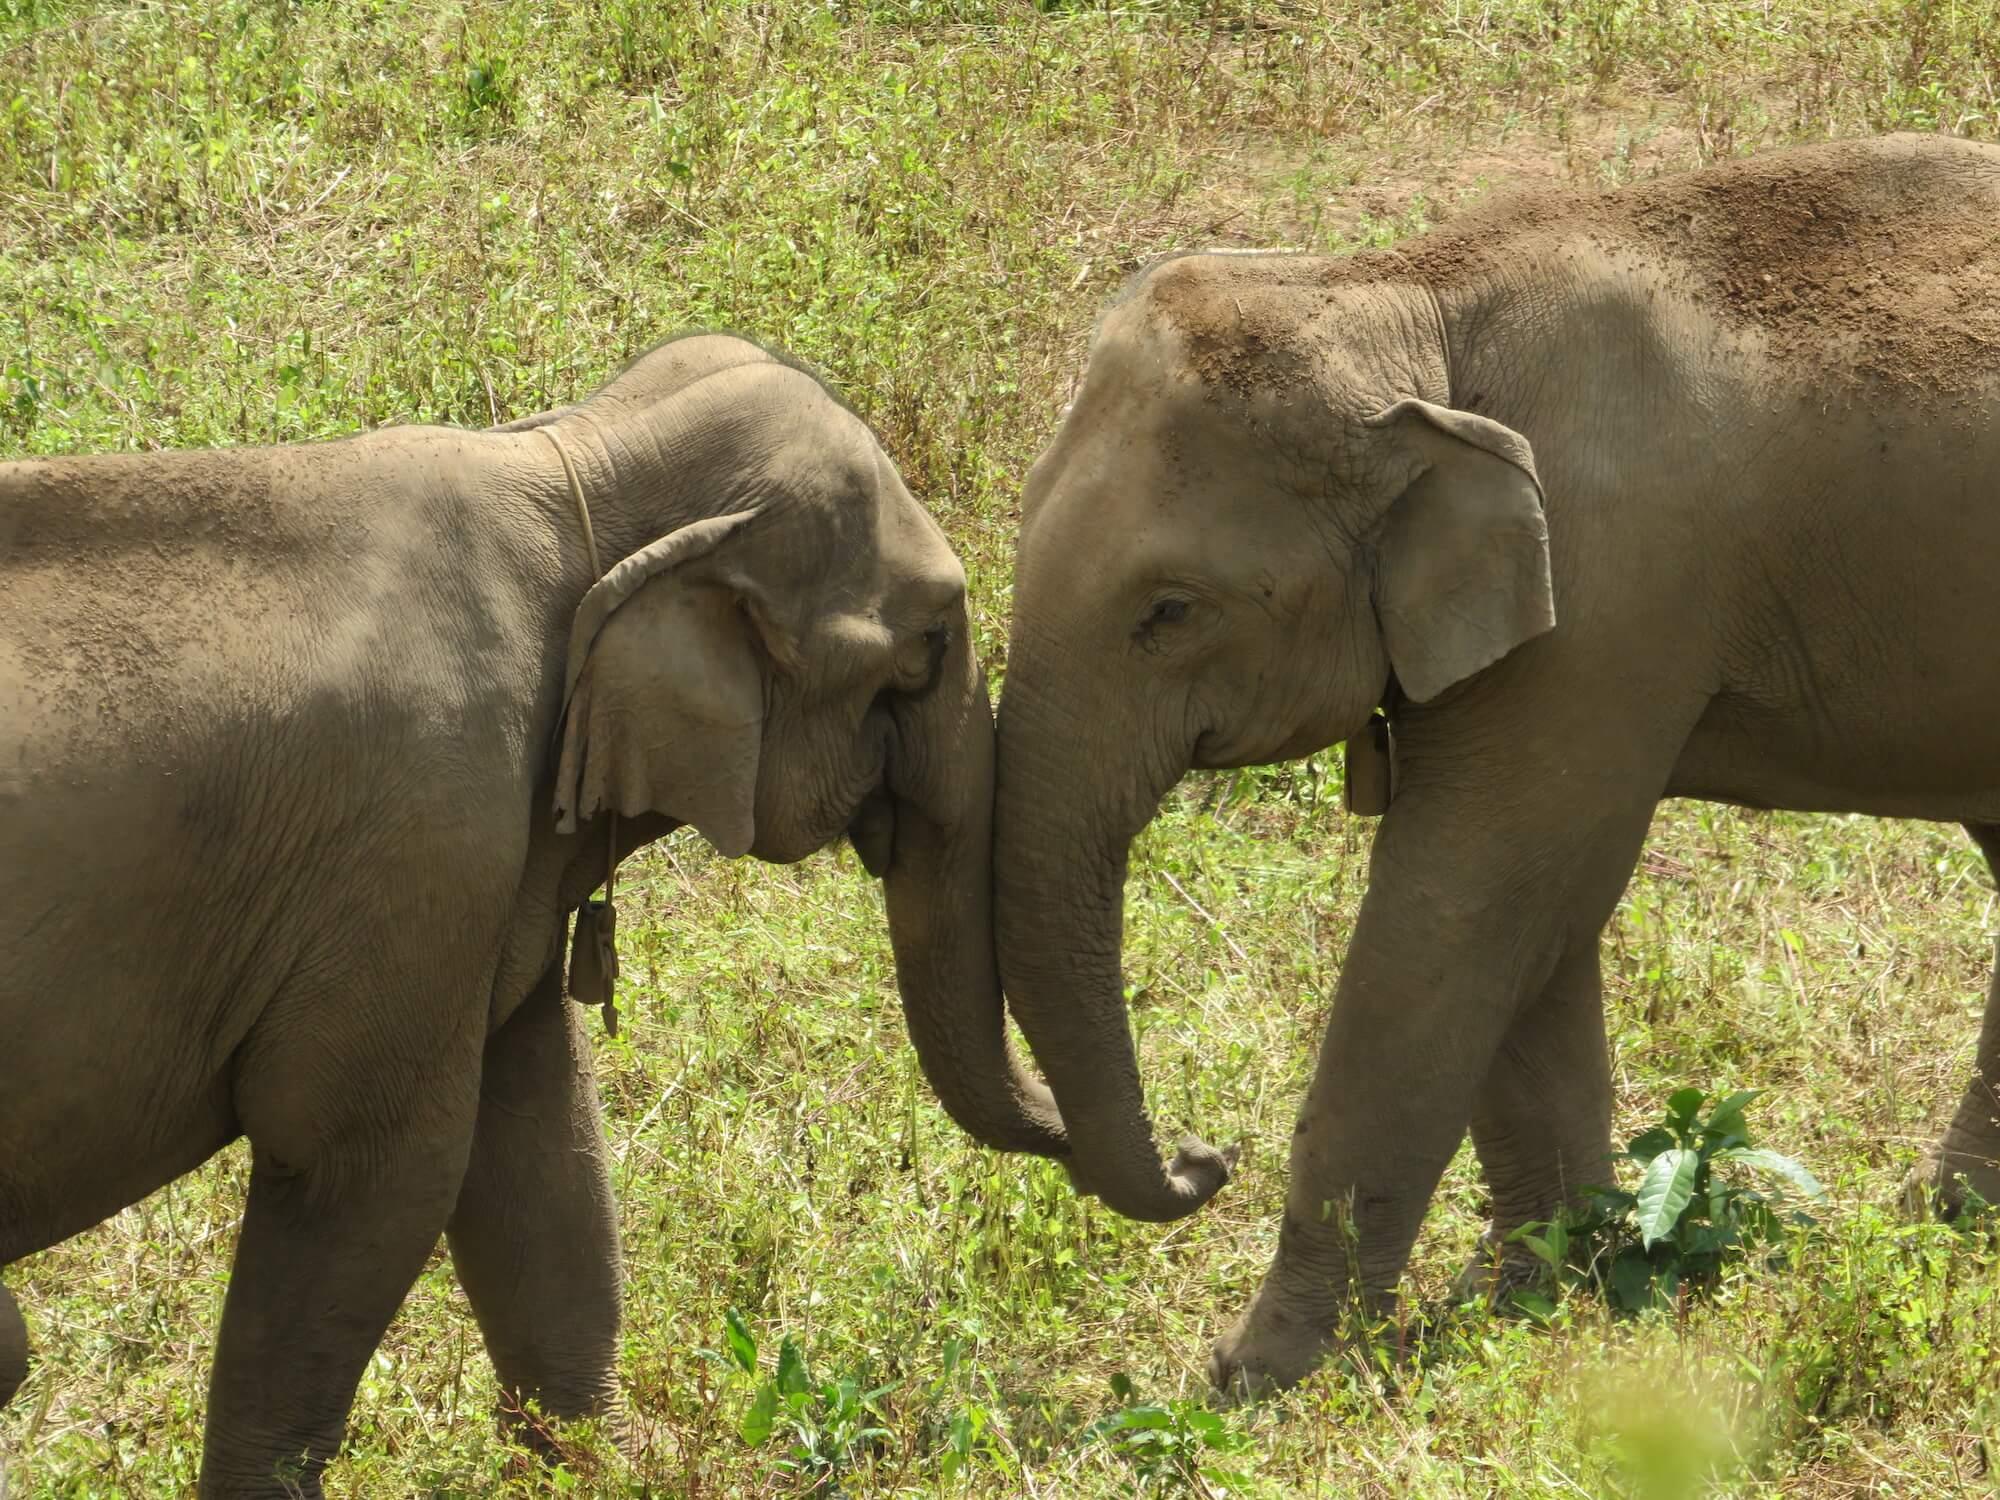 elephants-biosphere-thailand